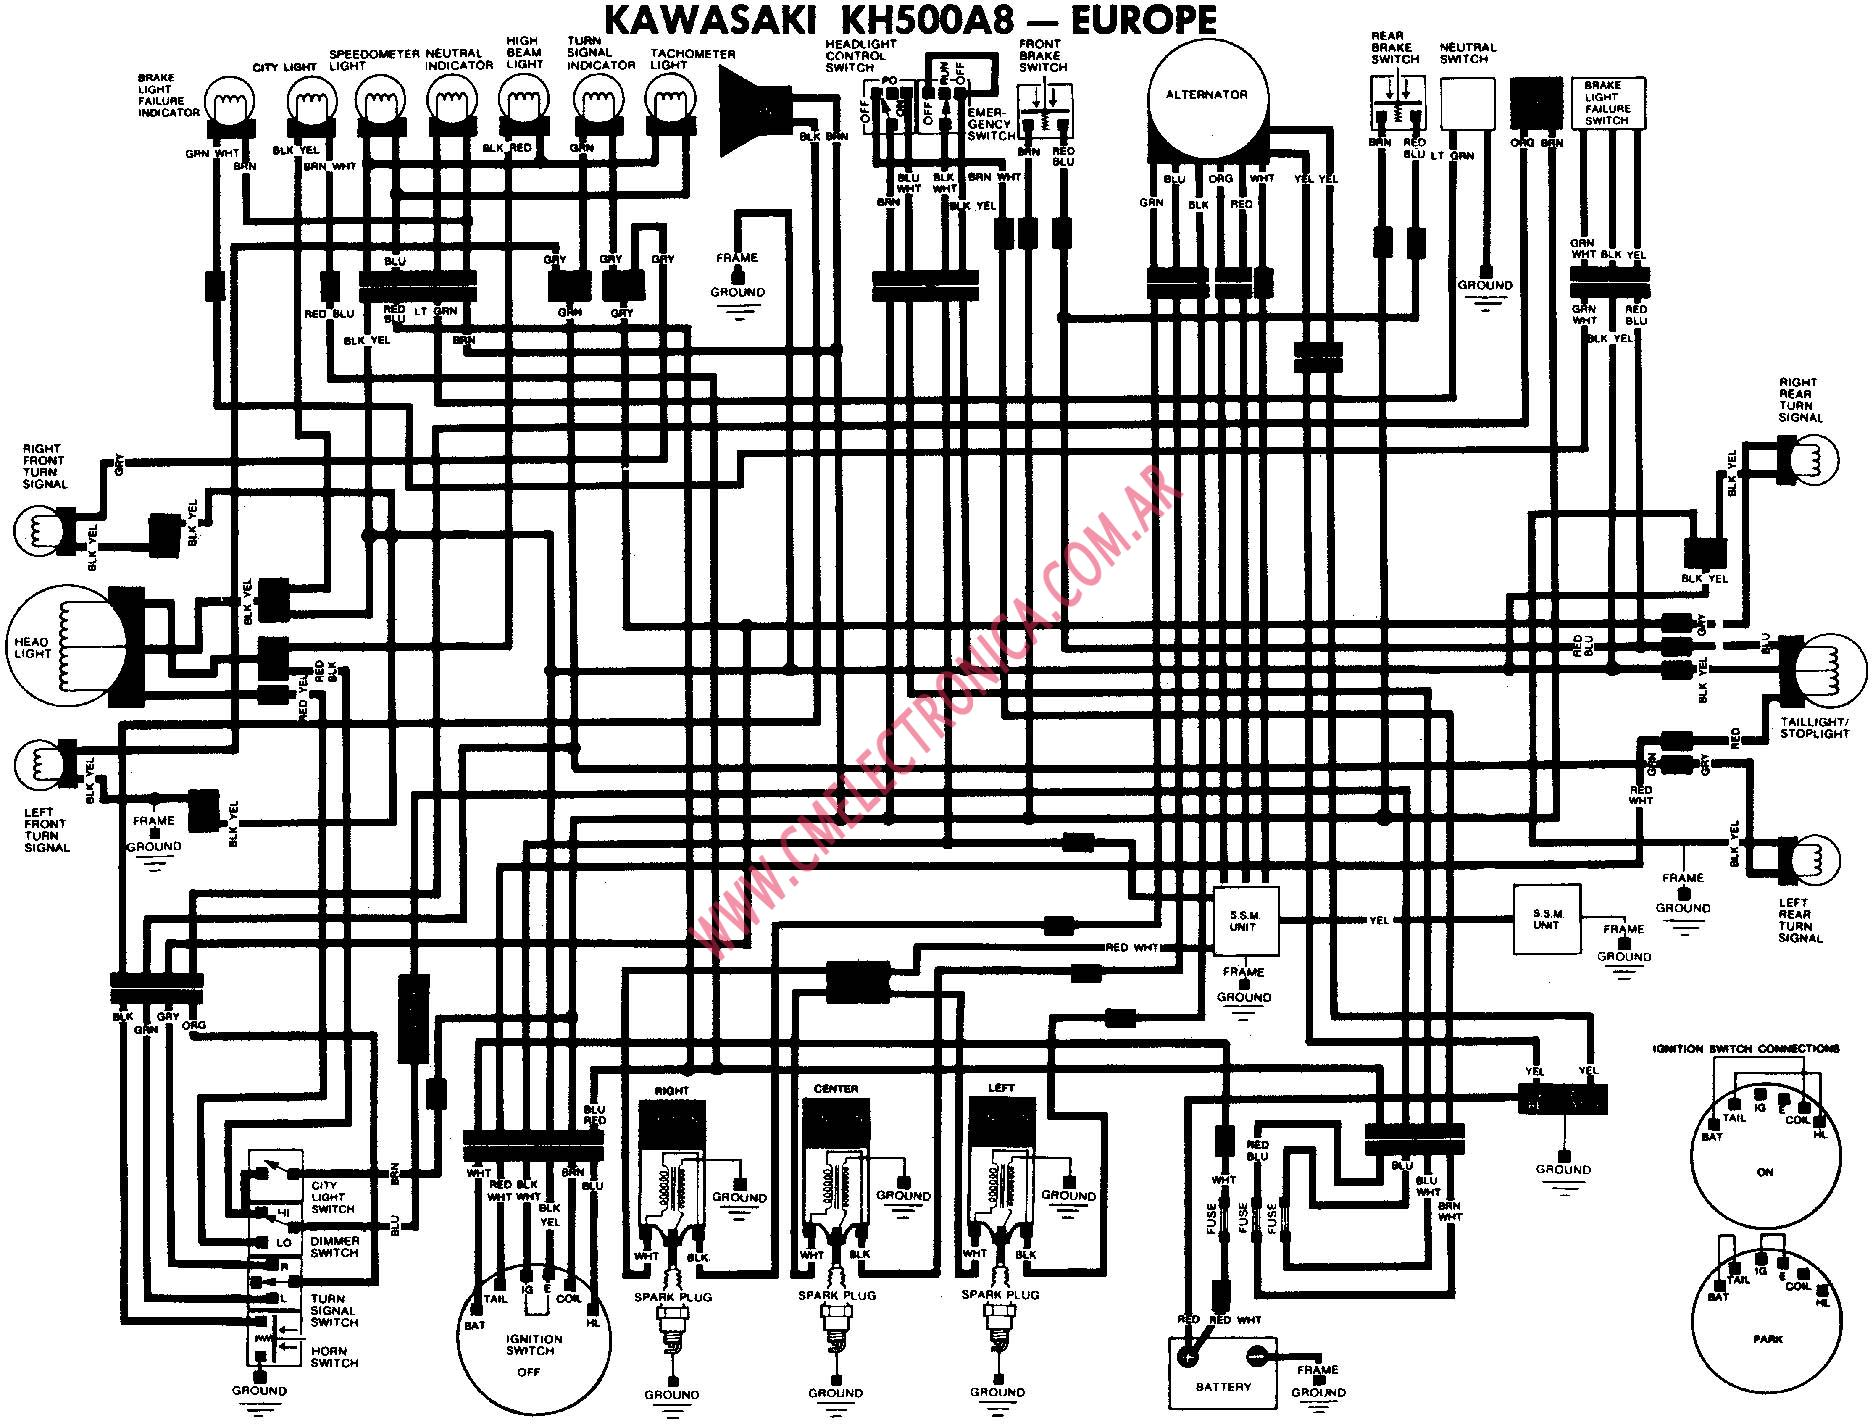 Kawasaki Brute Force 750 Wiring - Wiring Diagram M4 on